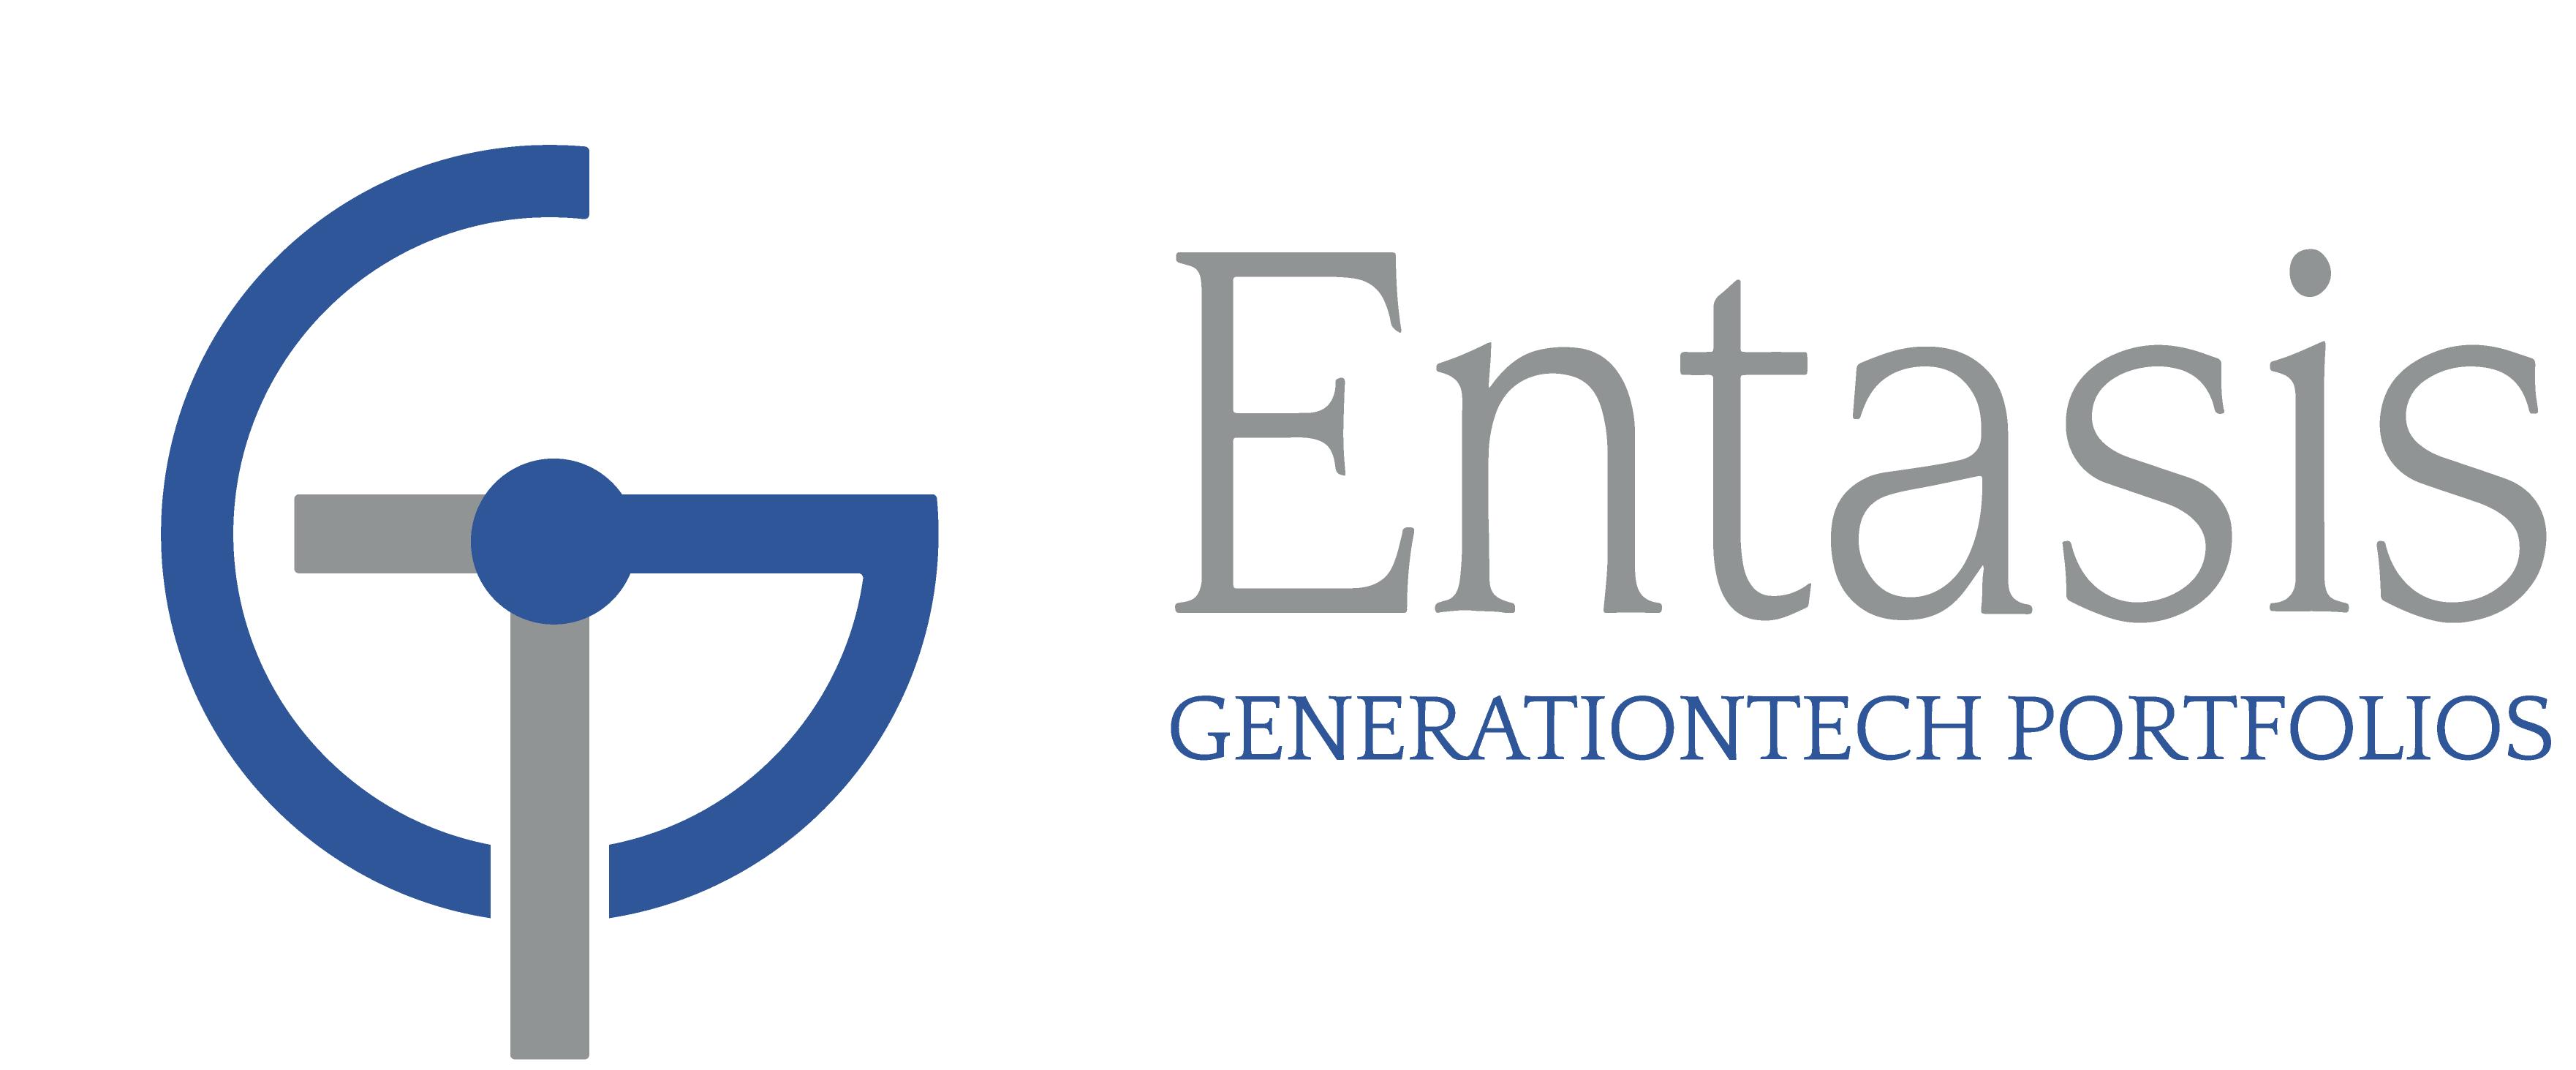 Entasis-GenerationTech-Portfolios-01